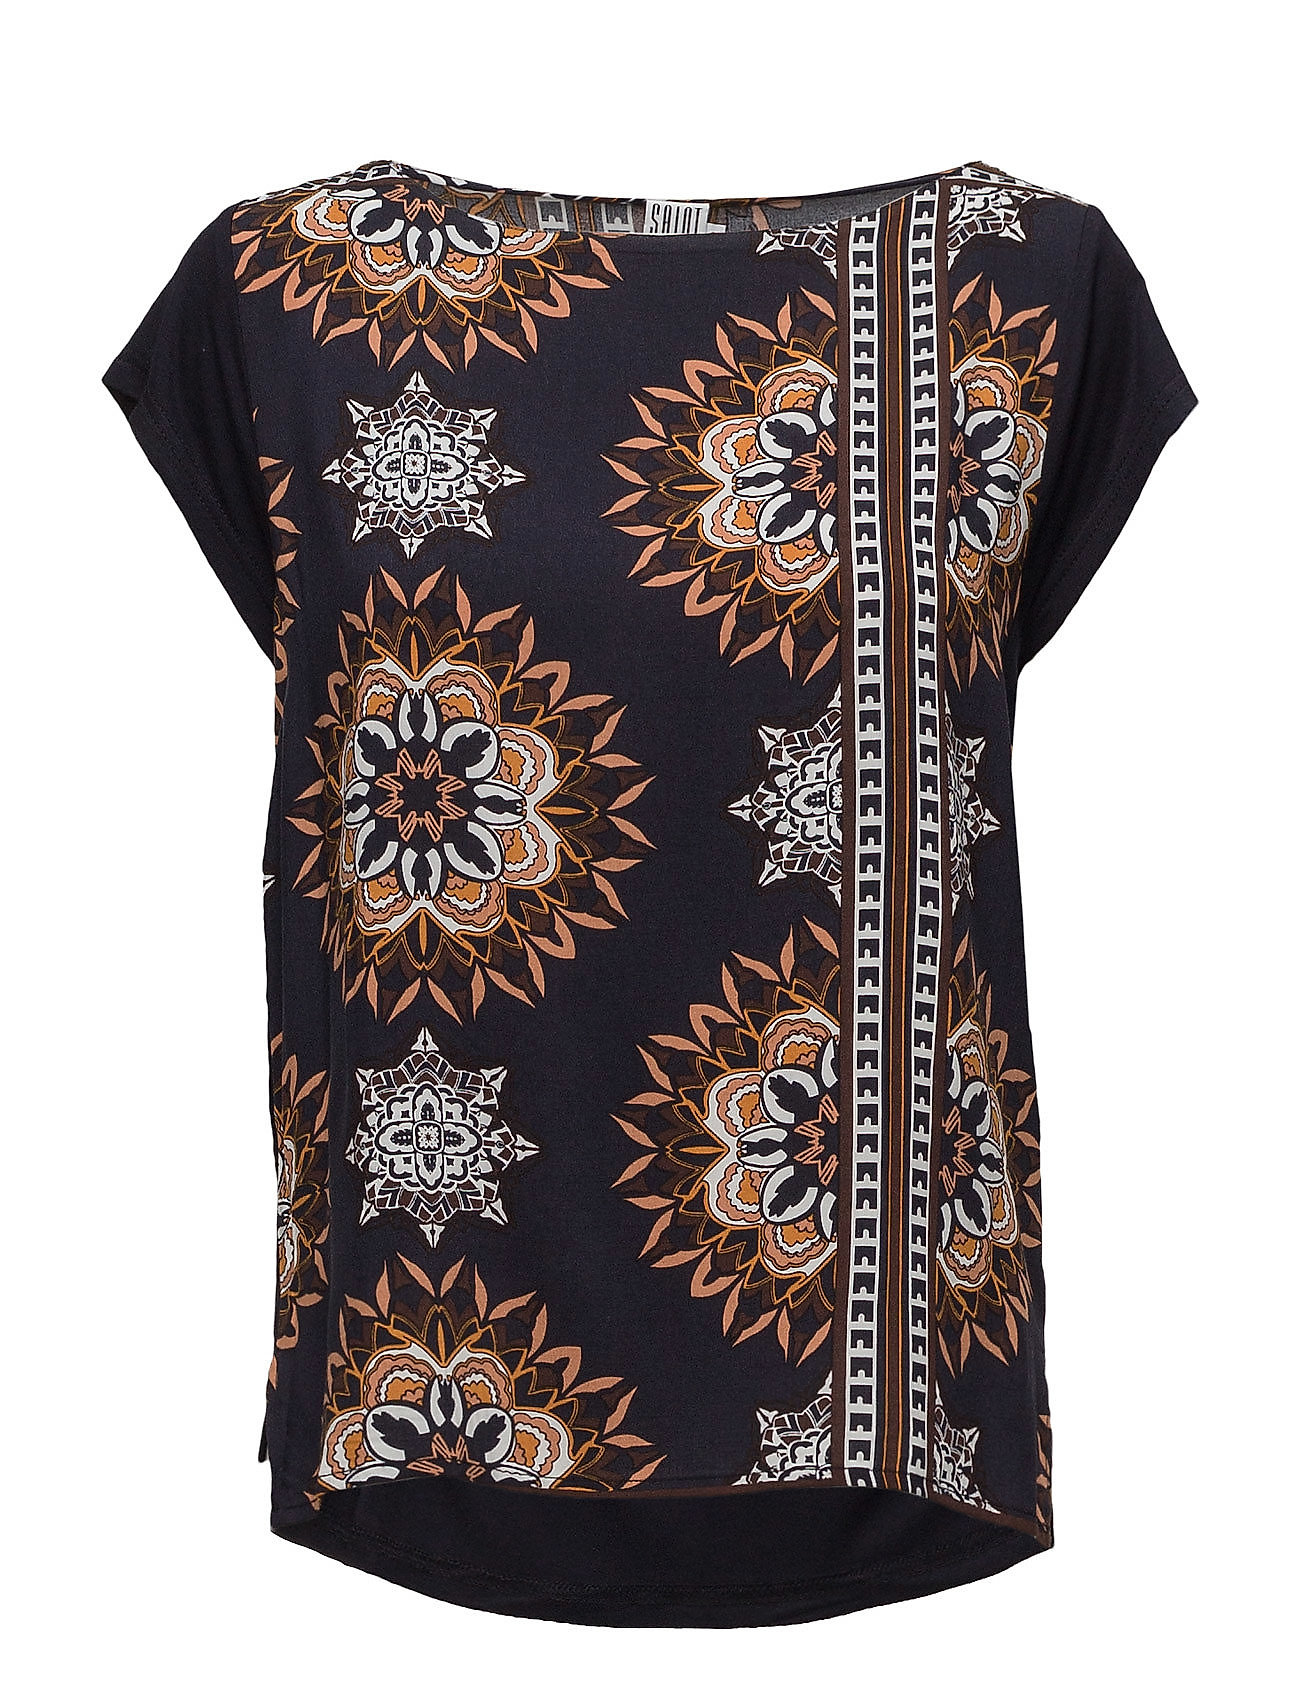 saint tropez – Kaleidoscope t-shirt w. chiff. fra boozt.com dk